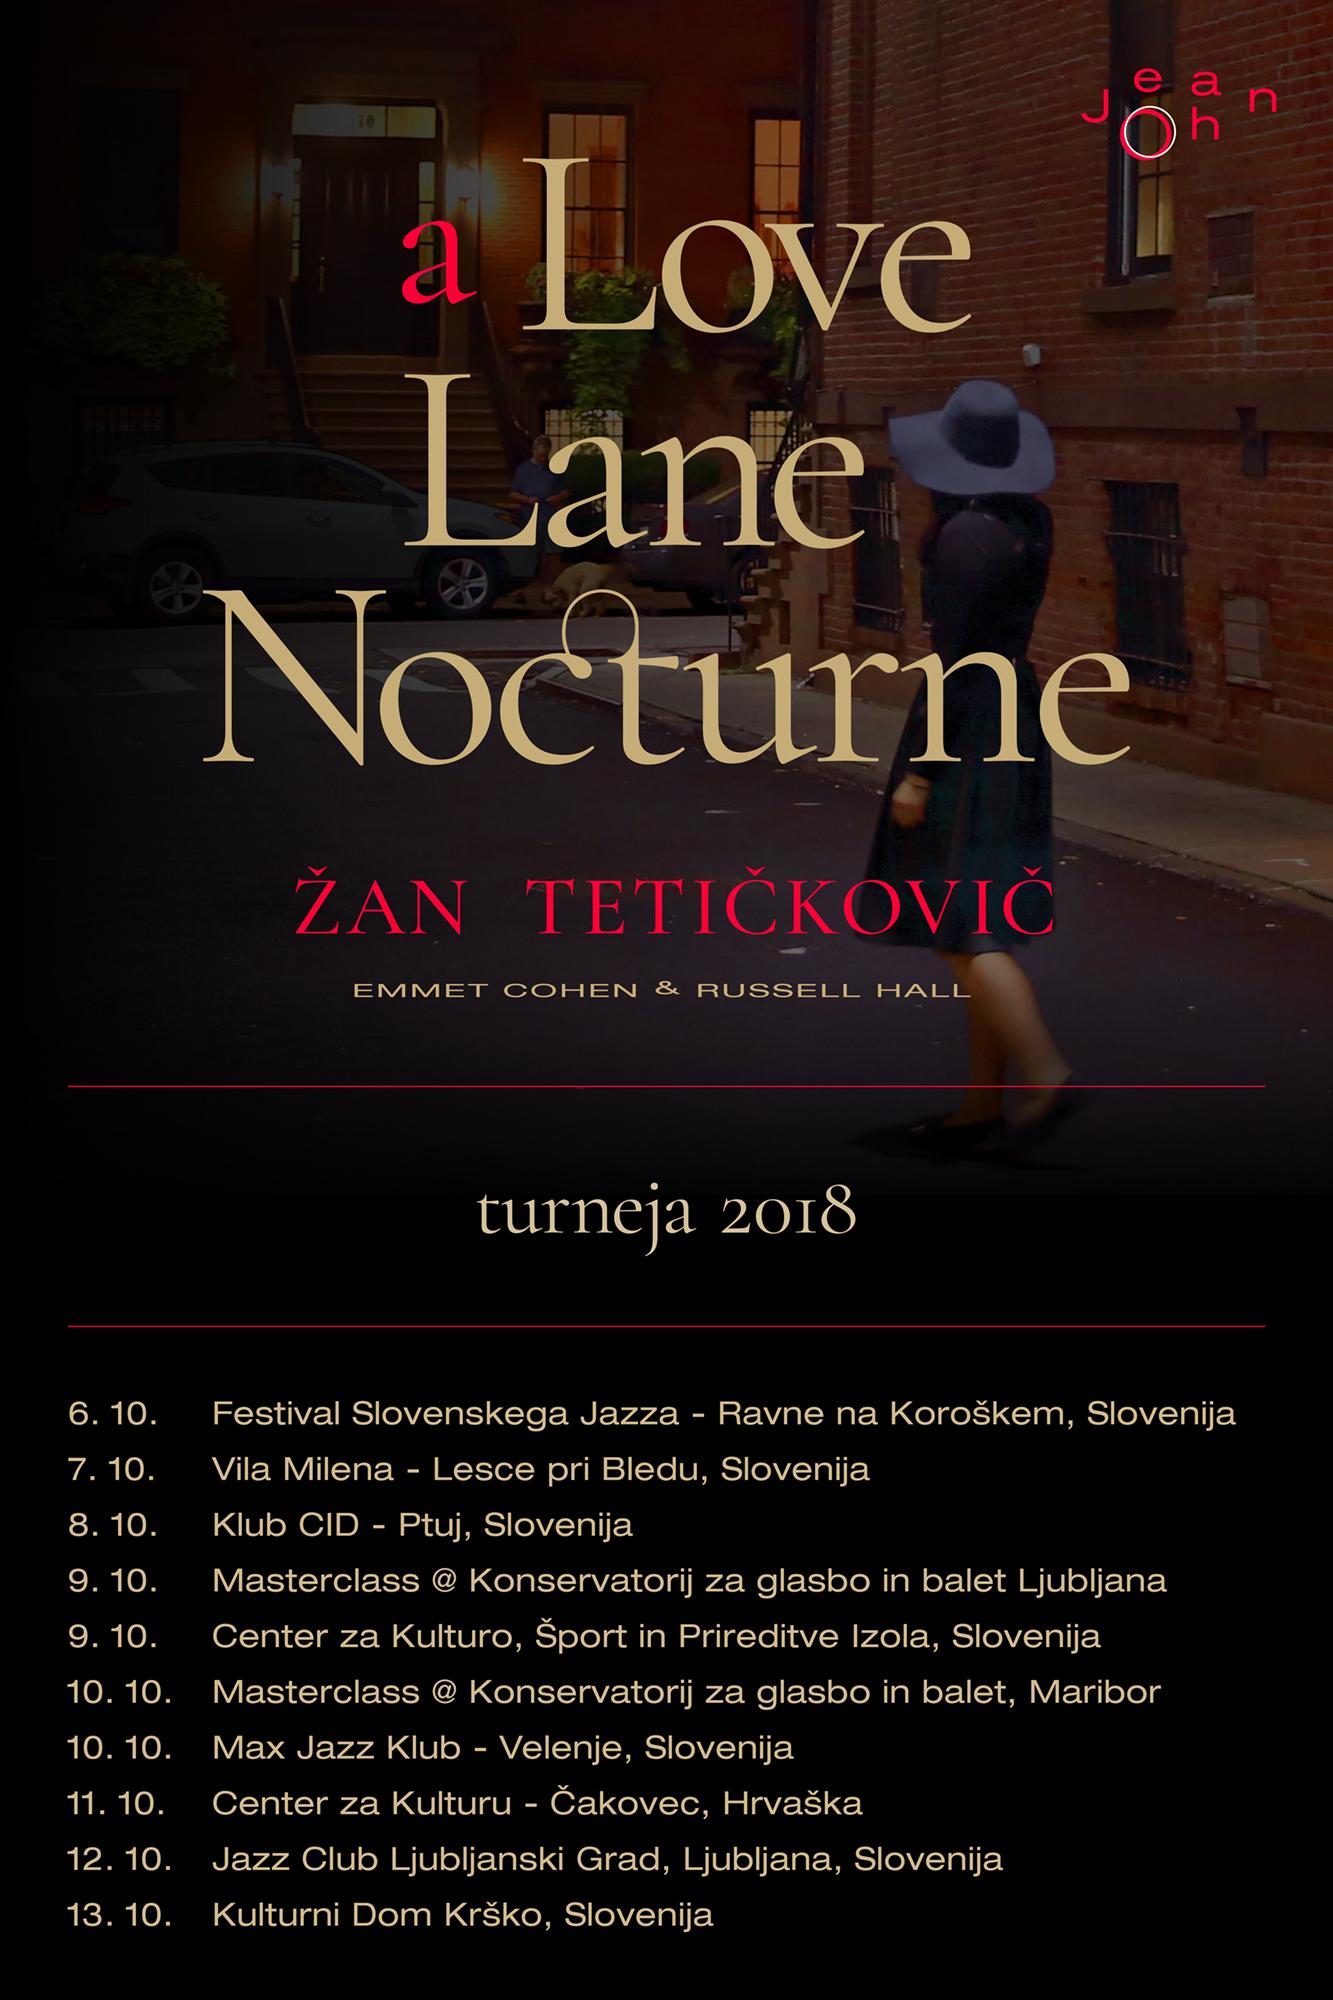 Žan Tetičkovič %22The New Standars Tr:o : General Tour poster : (Oct 6-13 2018).png